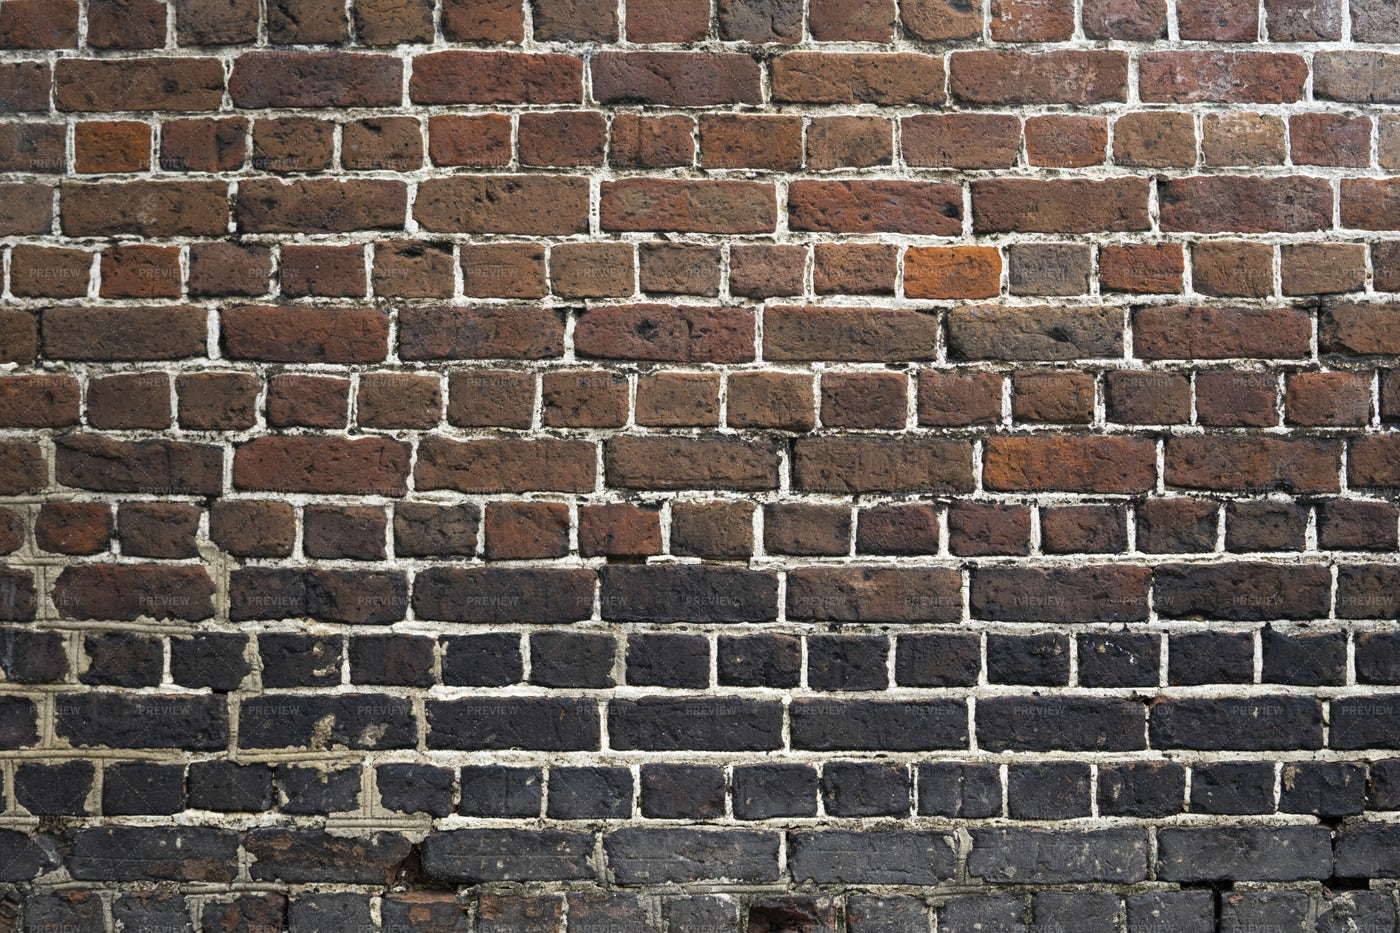 Vintage Brick Wall: Stock Photos